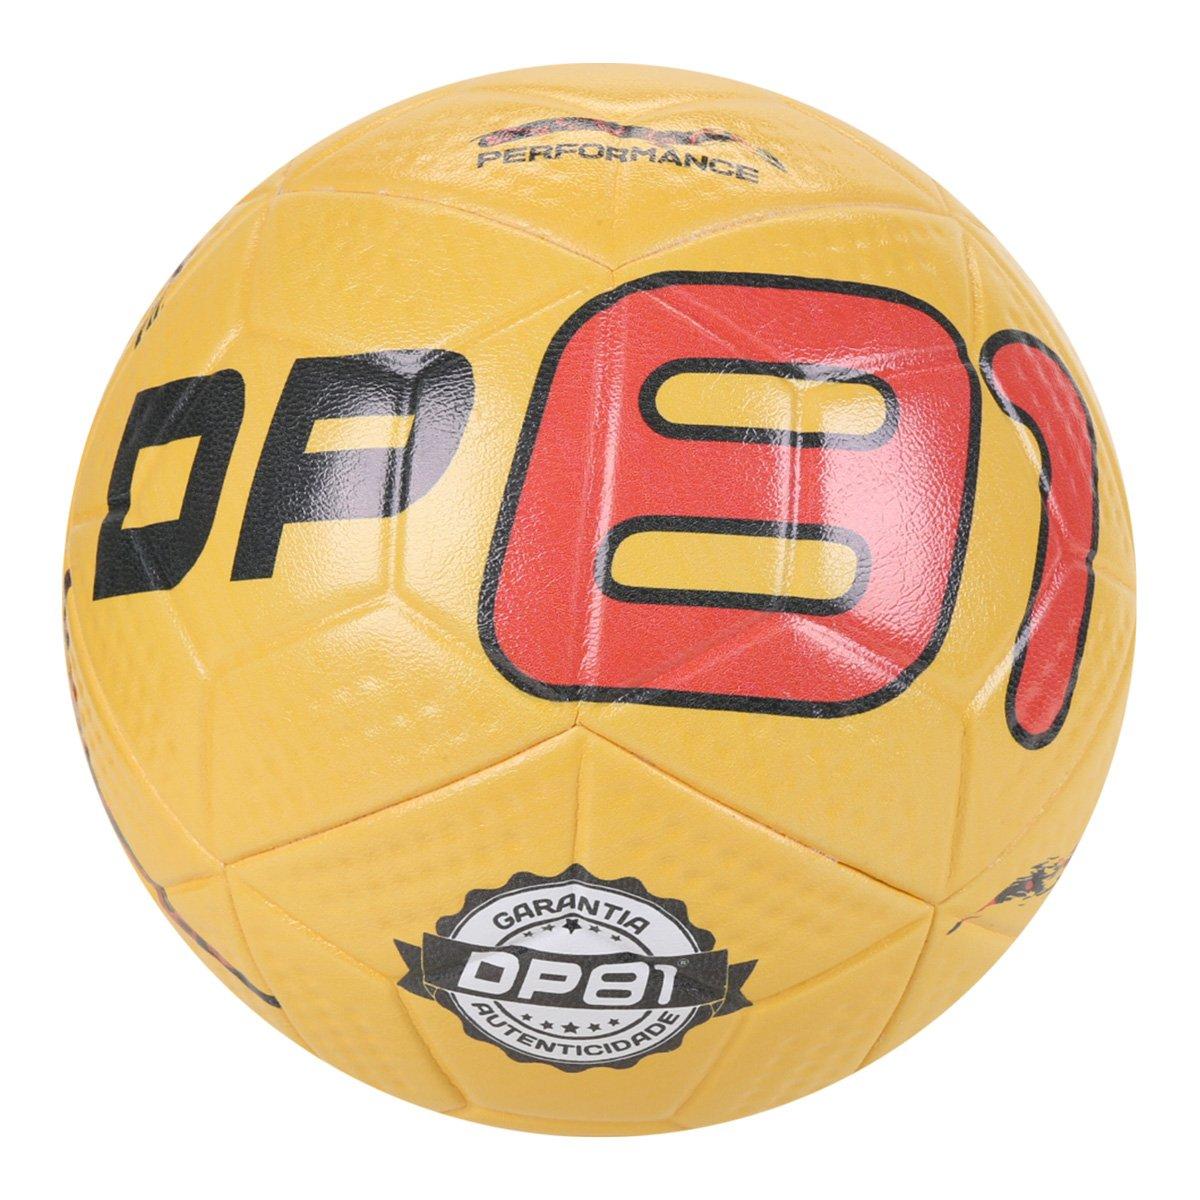 Bola de Futebol Campo Since 81 Fusion 3D Performance